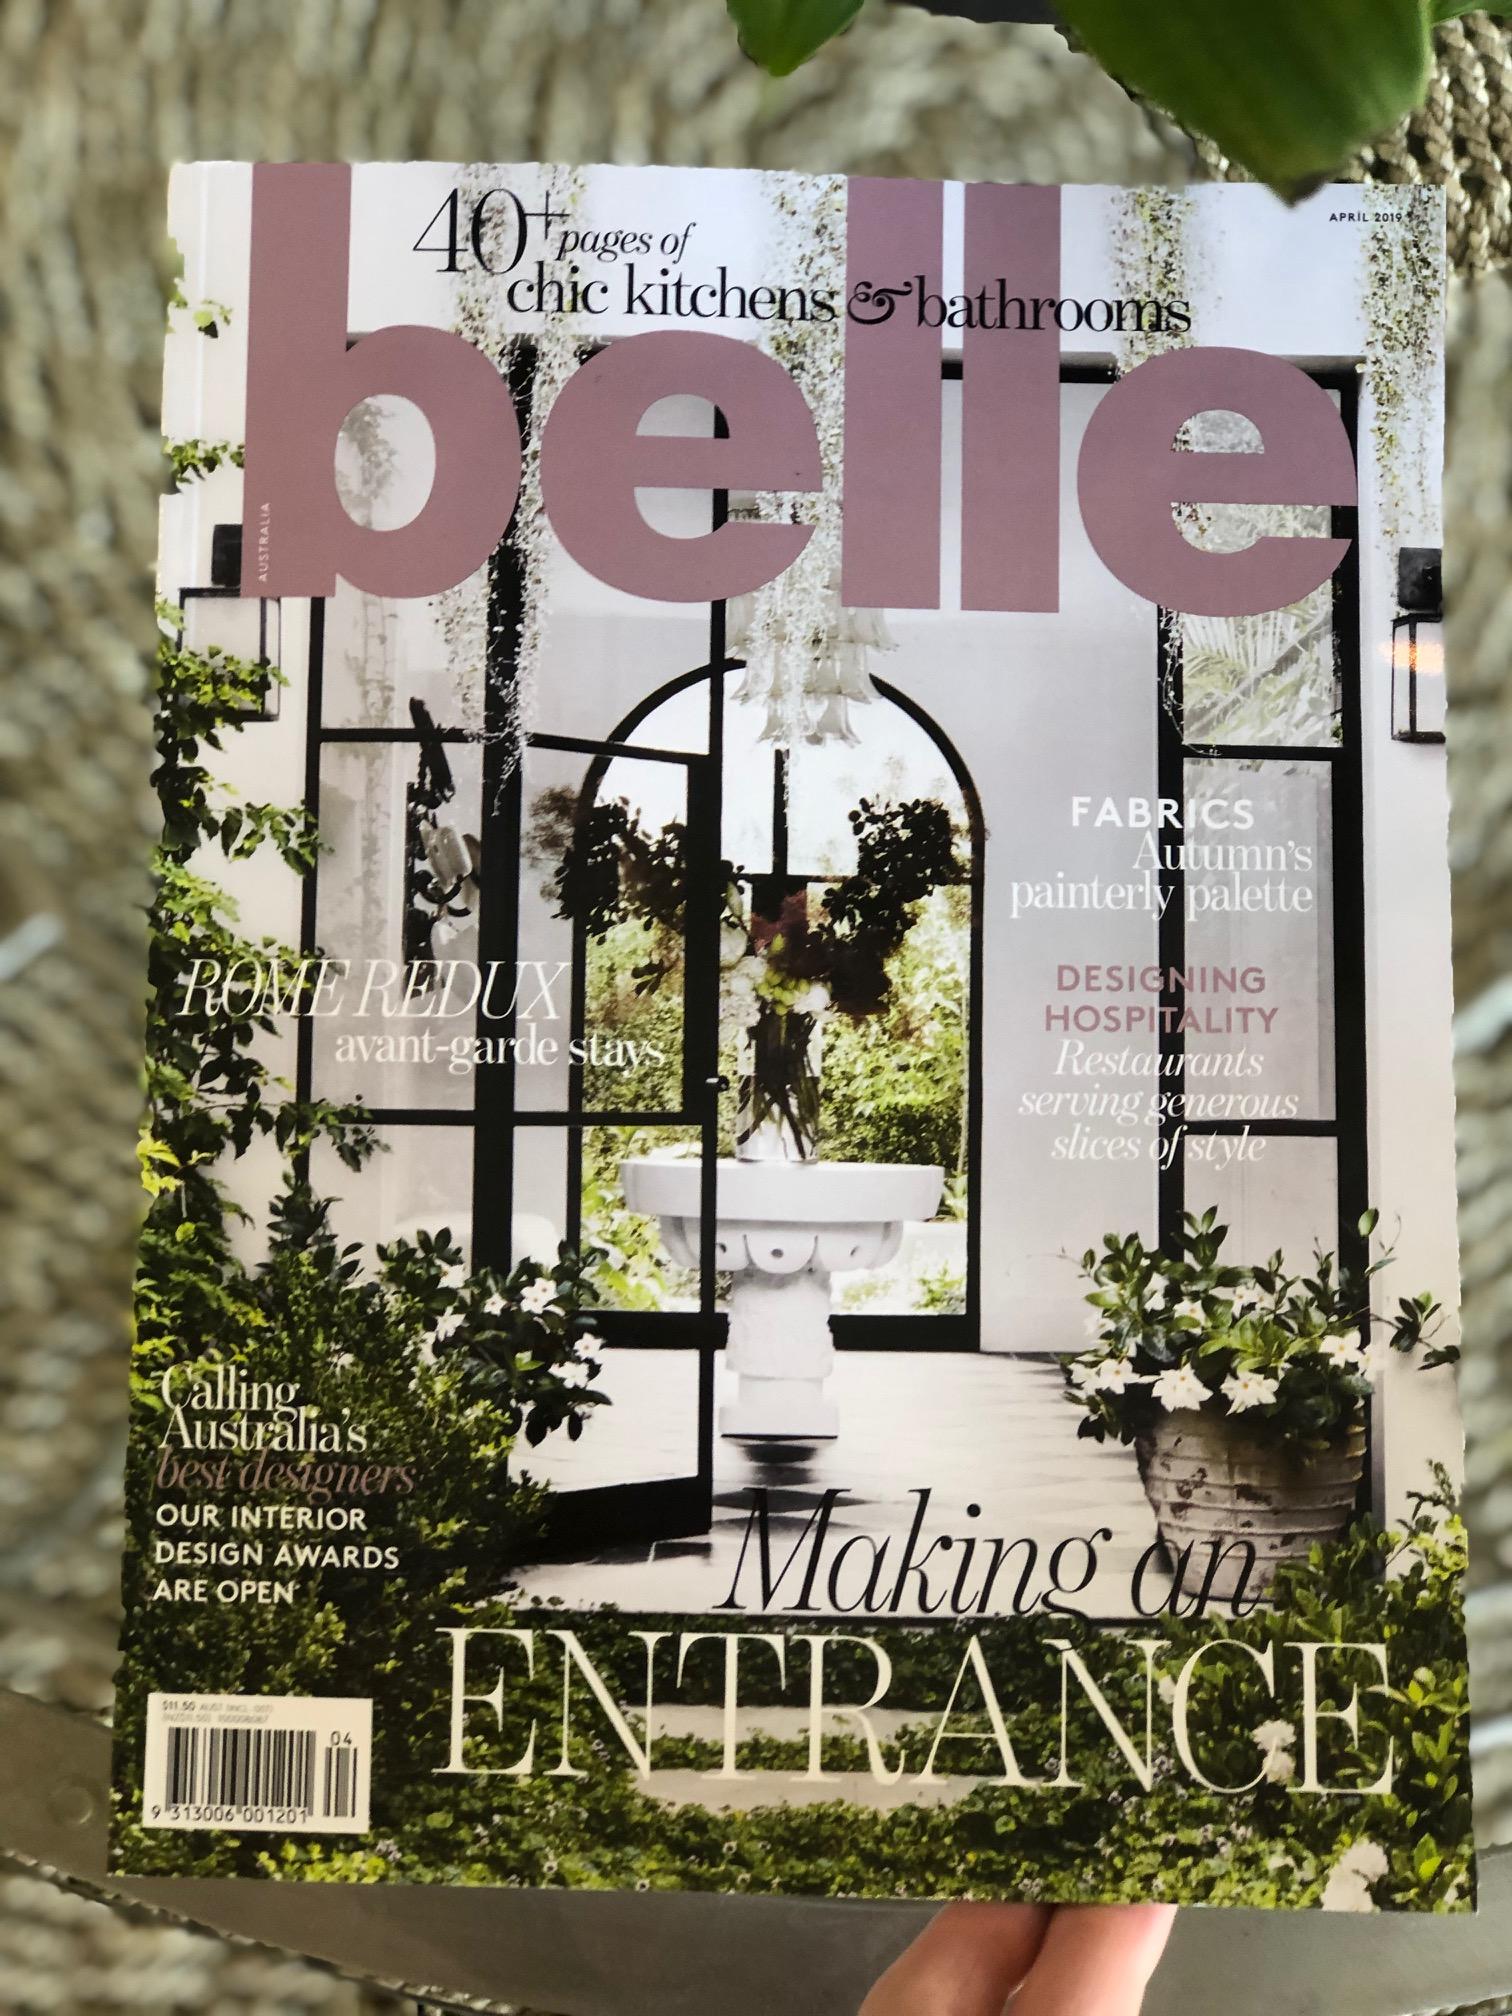 Belle Magazine Lifespaces Group 2.jpg